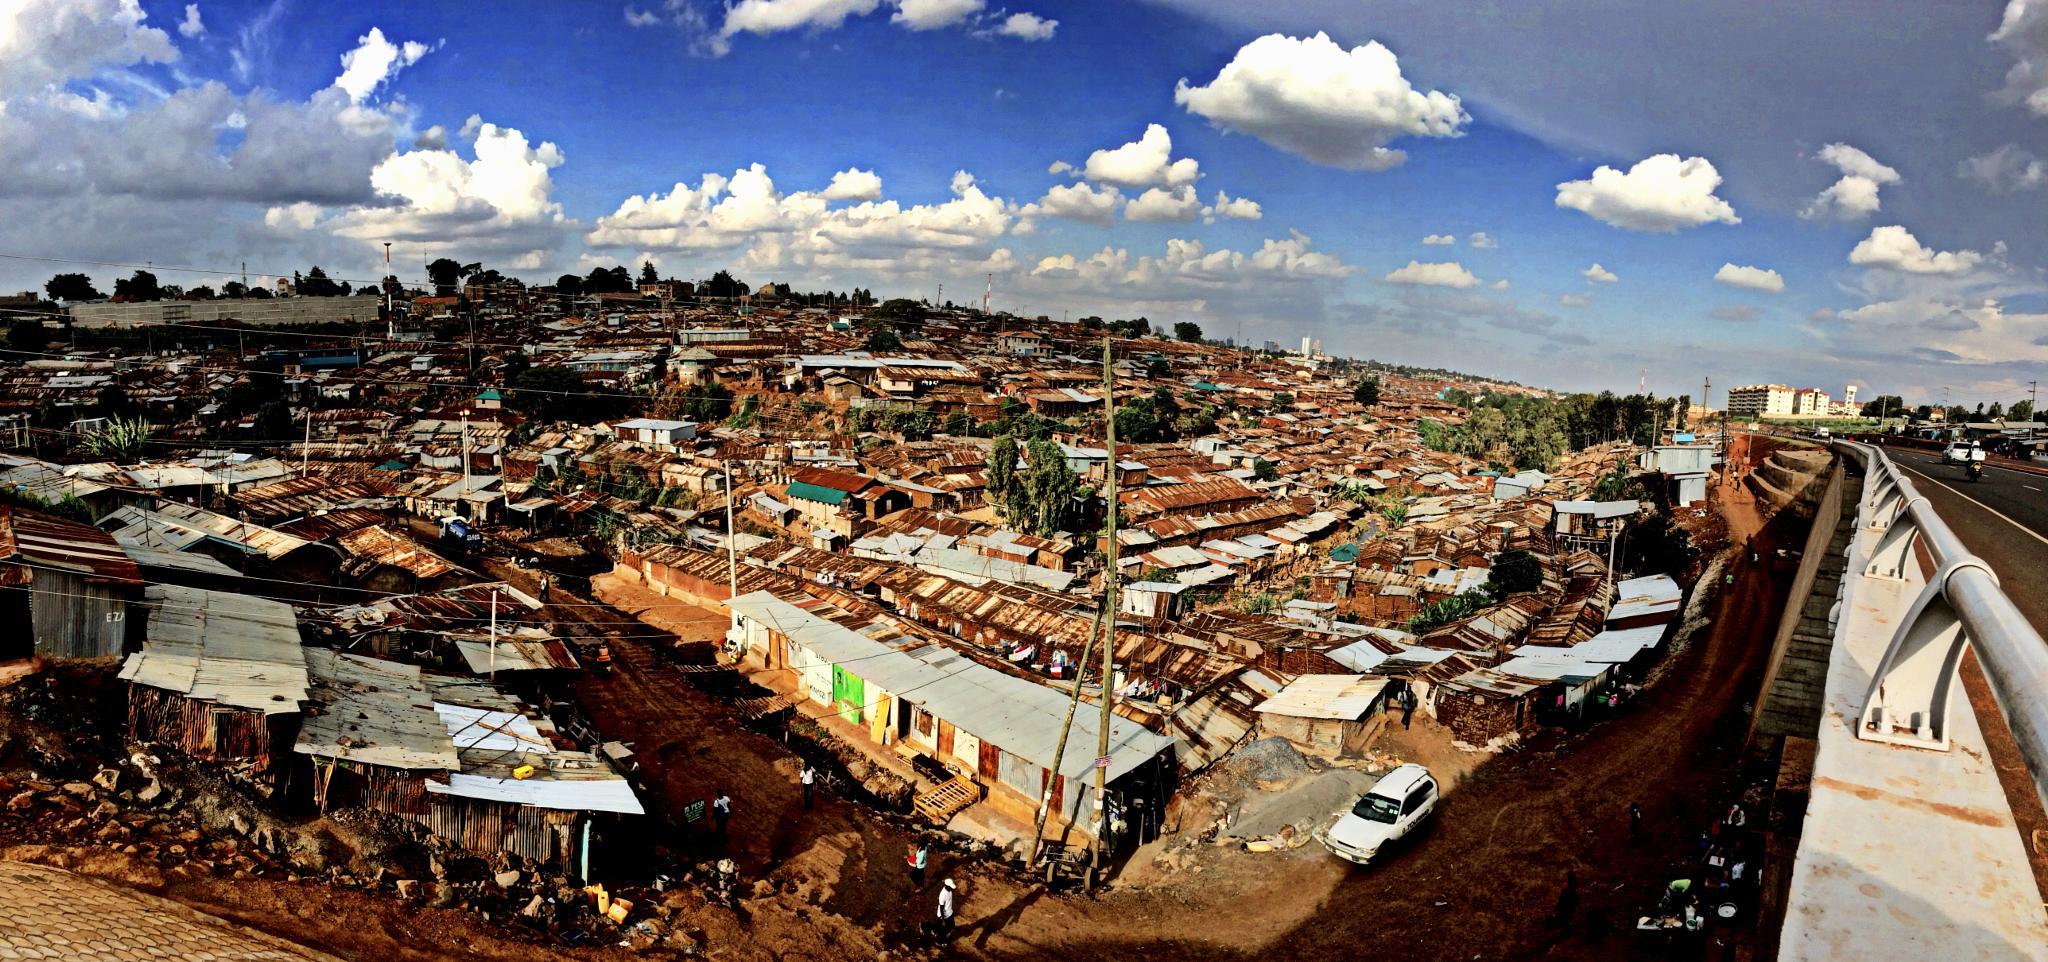 Kibera Slum by ianmbugz